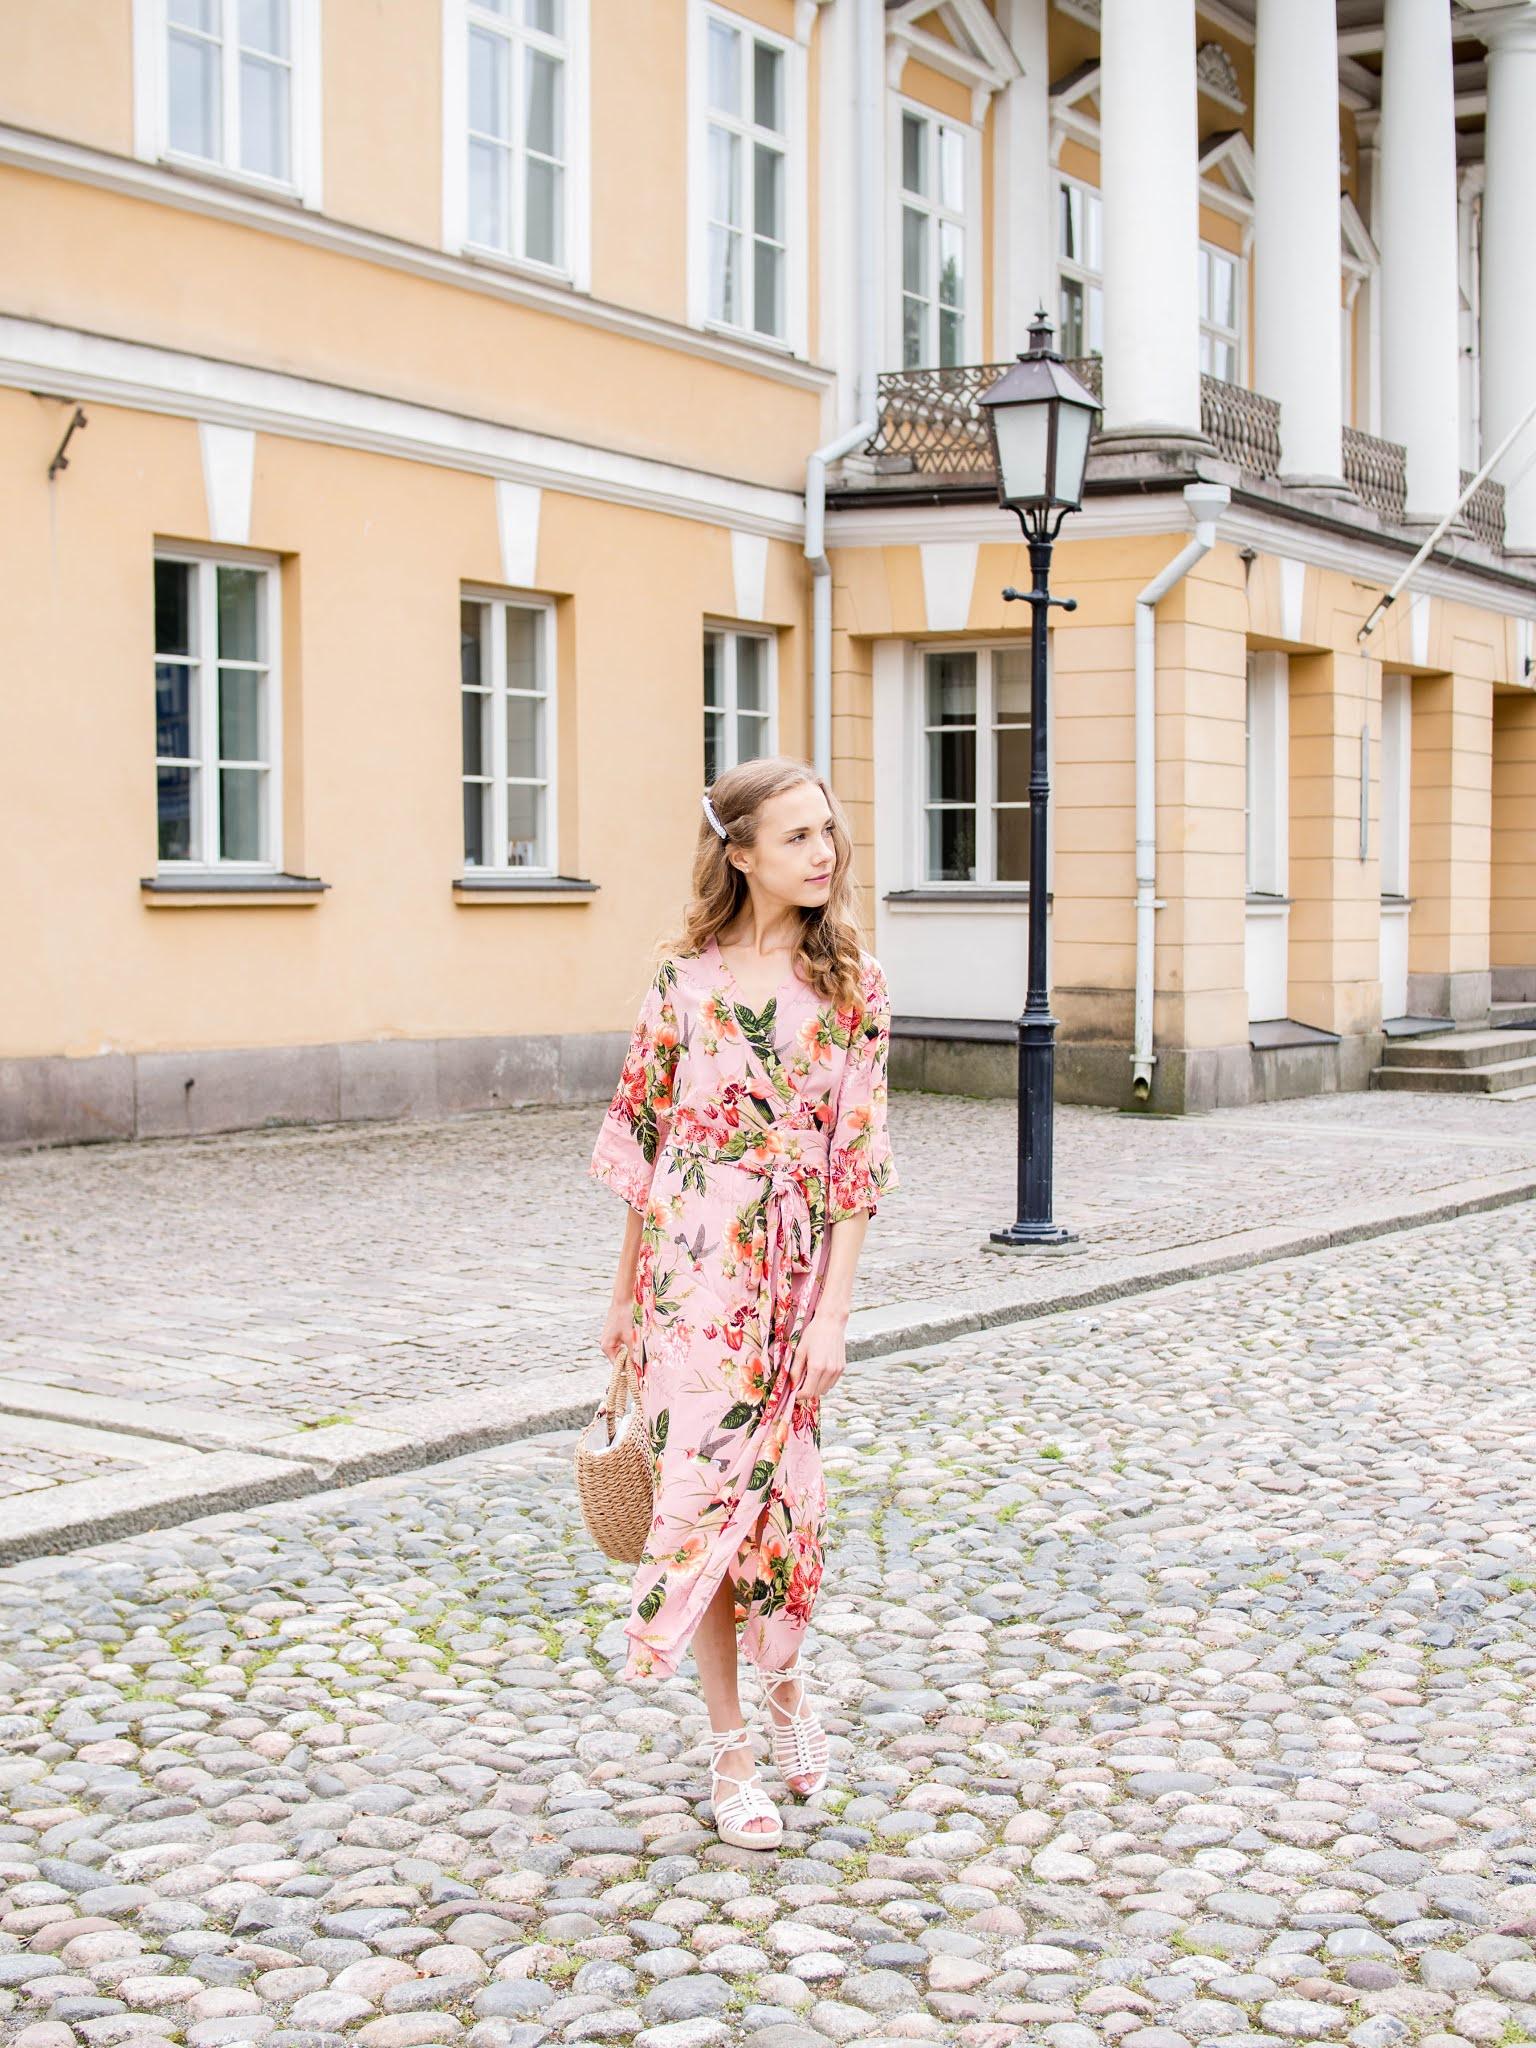 Summer outfit with pink floral midi dress and straw bag - Keäasu, vaaleanpunainen kukkamekko, korilaukku